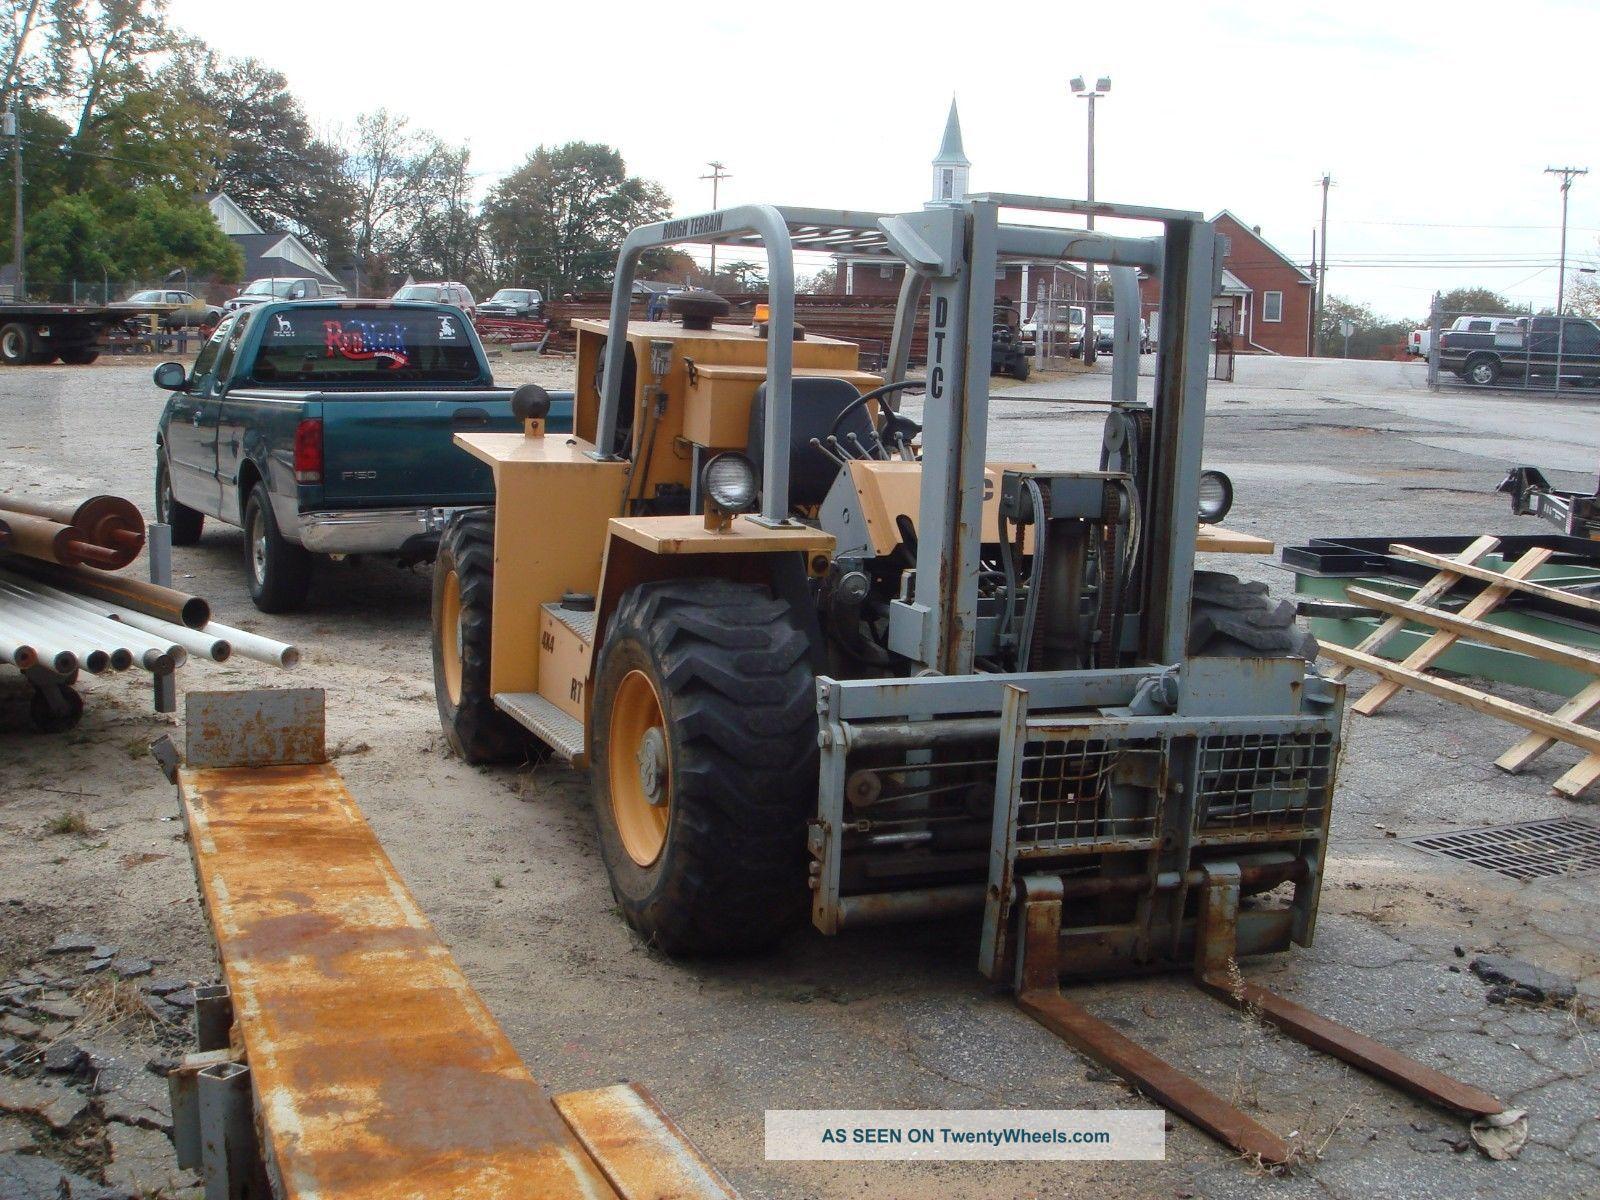 Dtc Rt8606 Rough Terrain Military Forklift